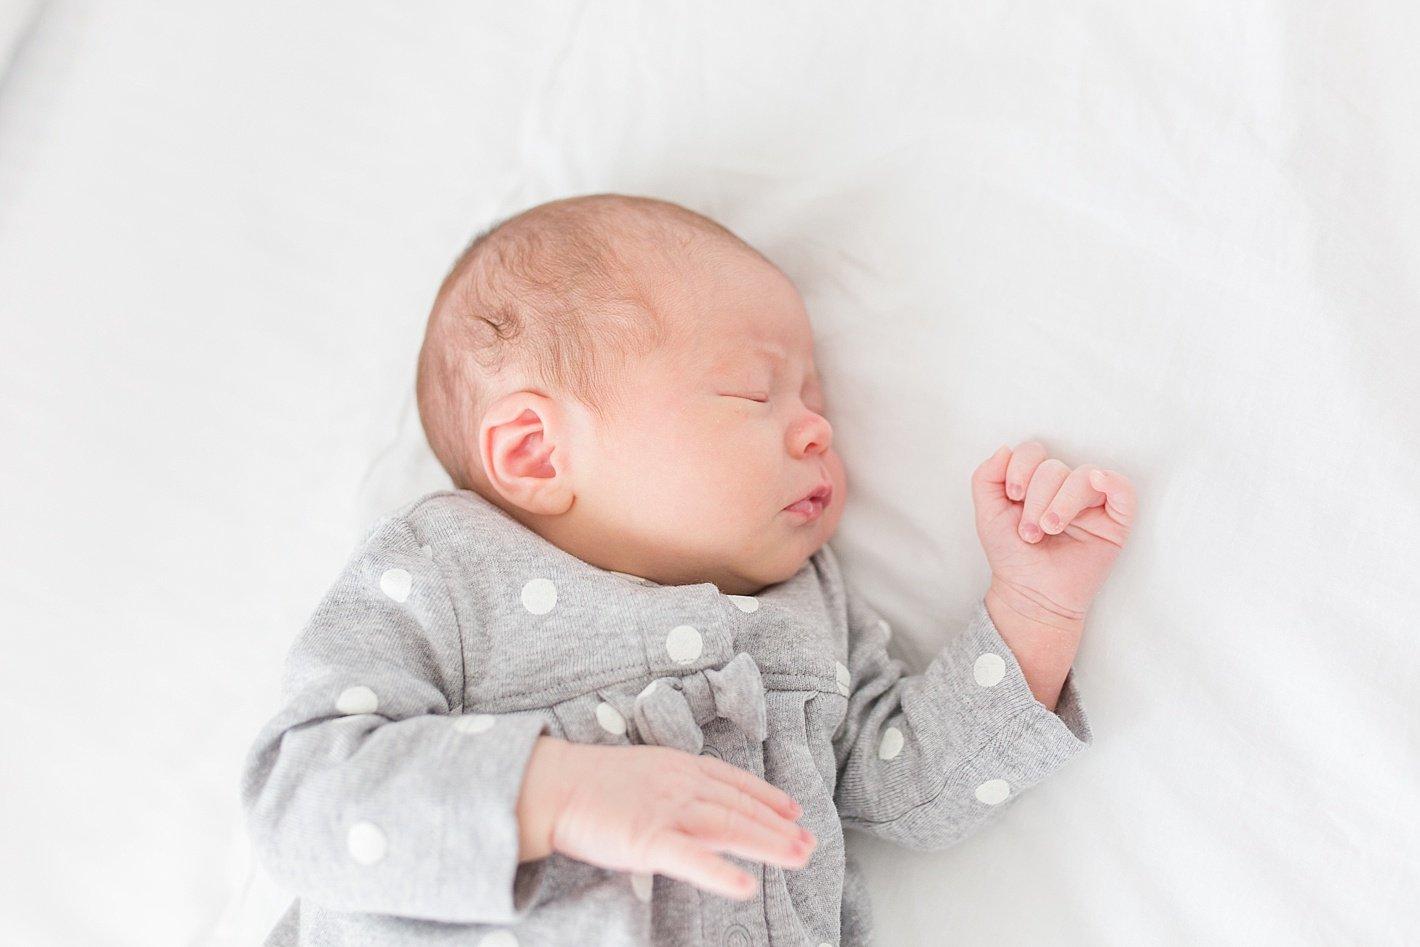 newborn_lifestyle_photographer_arpasi_photography_family_photographer_baltimore_photographer_0023